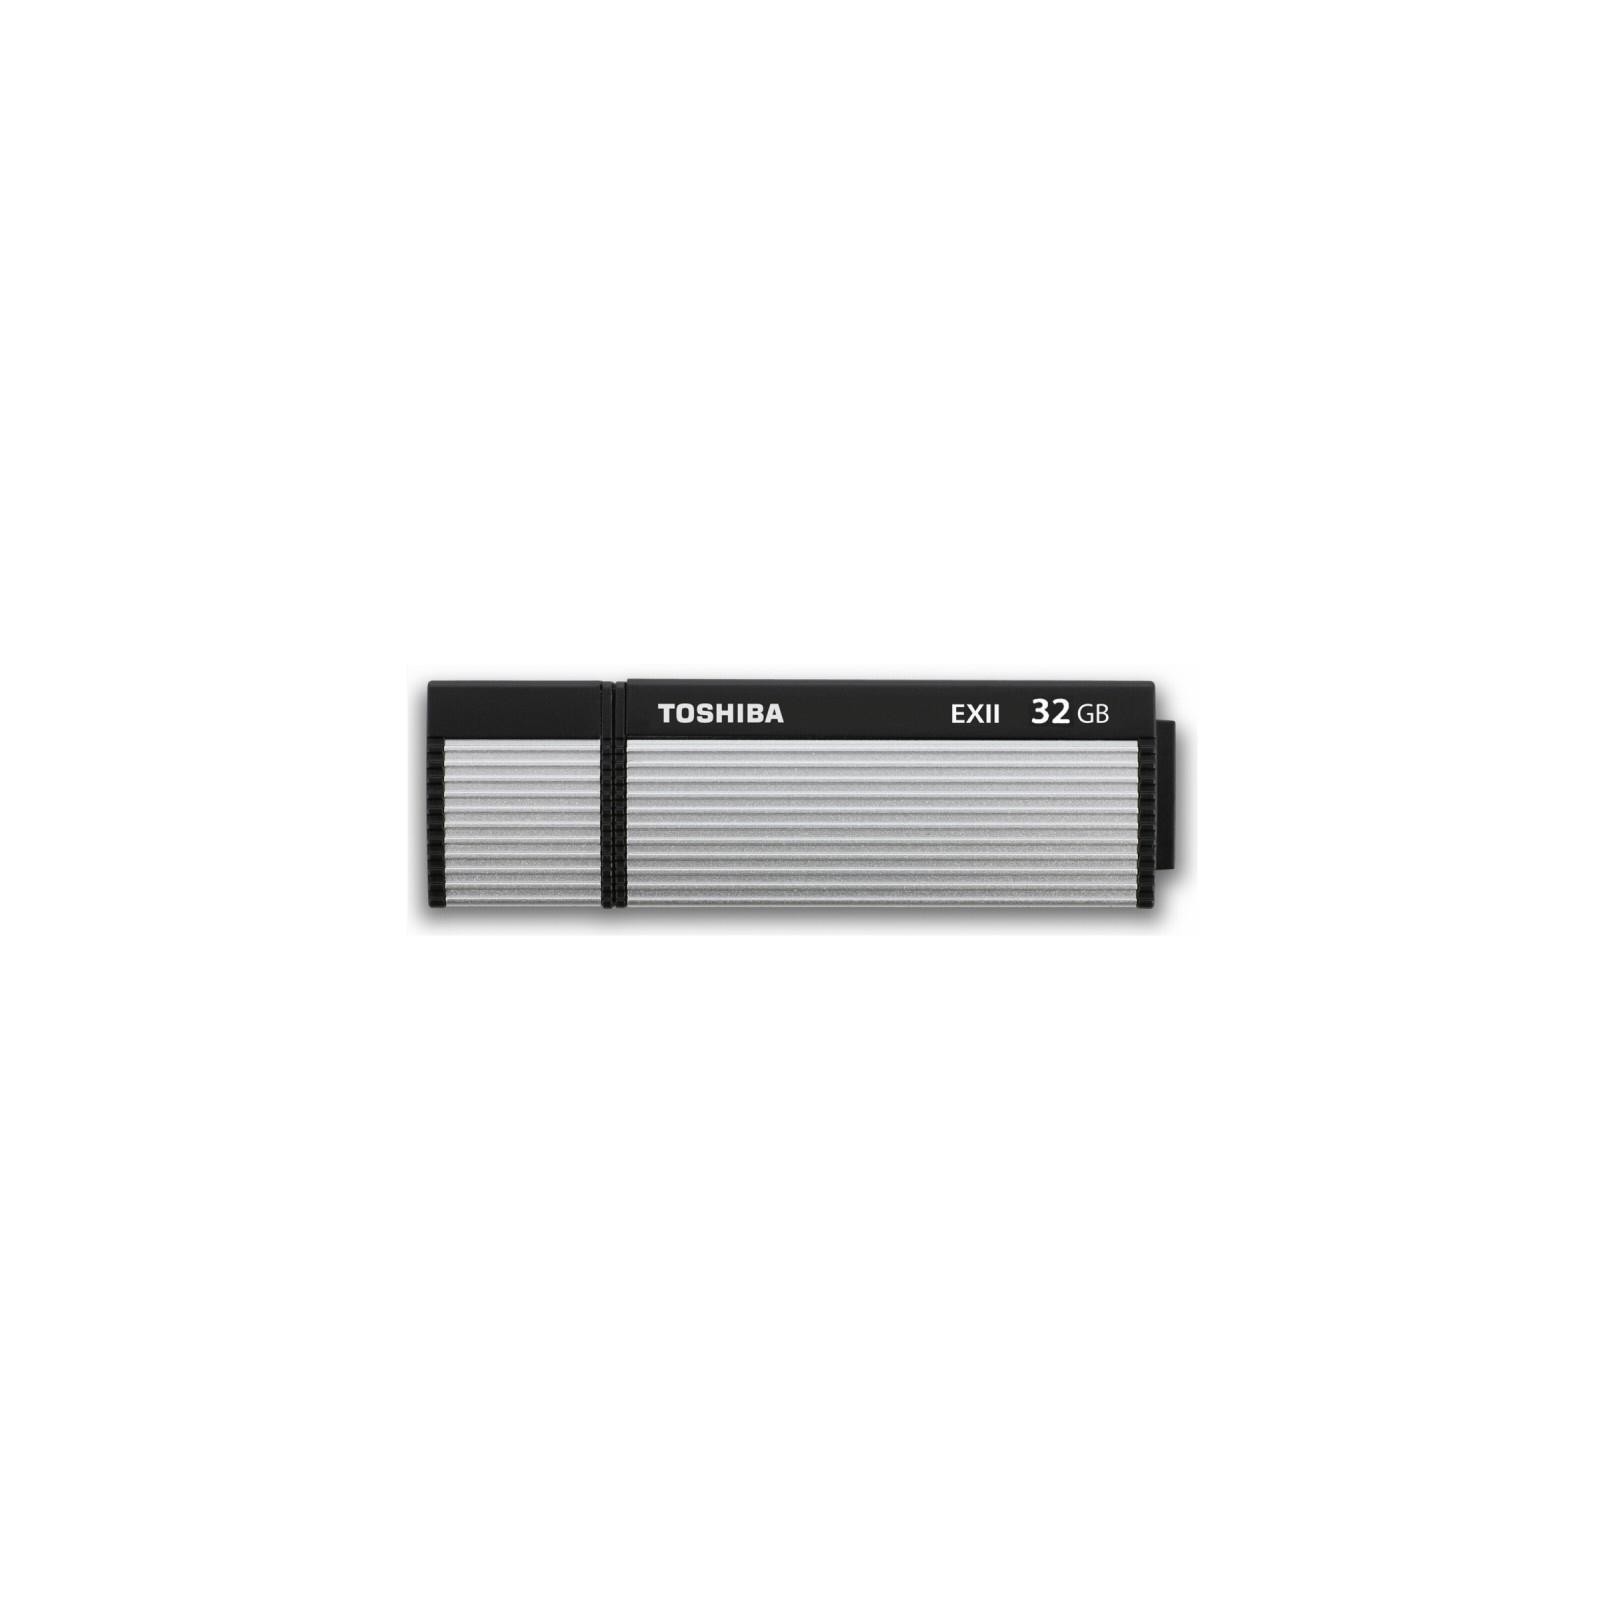 USB флеш накопитель TOSHIBA 32GB Oshumi EX-|| Silver USB 3.0 (THNV32OSUSIL(8)